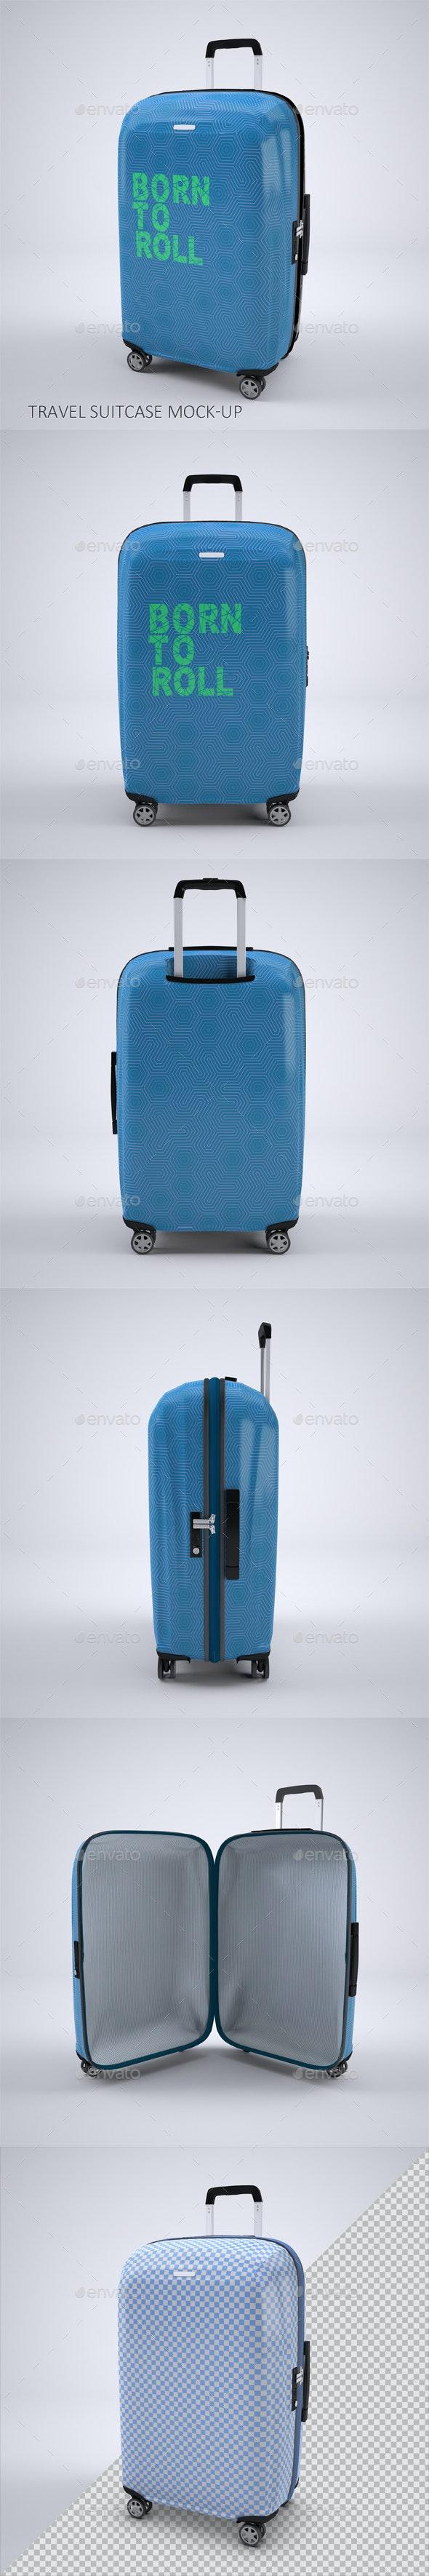 Travel Suitcase Mock-up - Product Mock-Ups Graphics